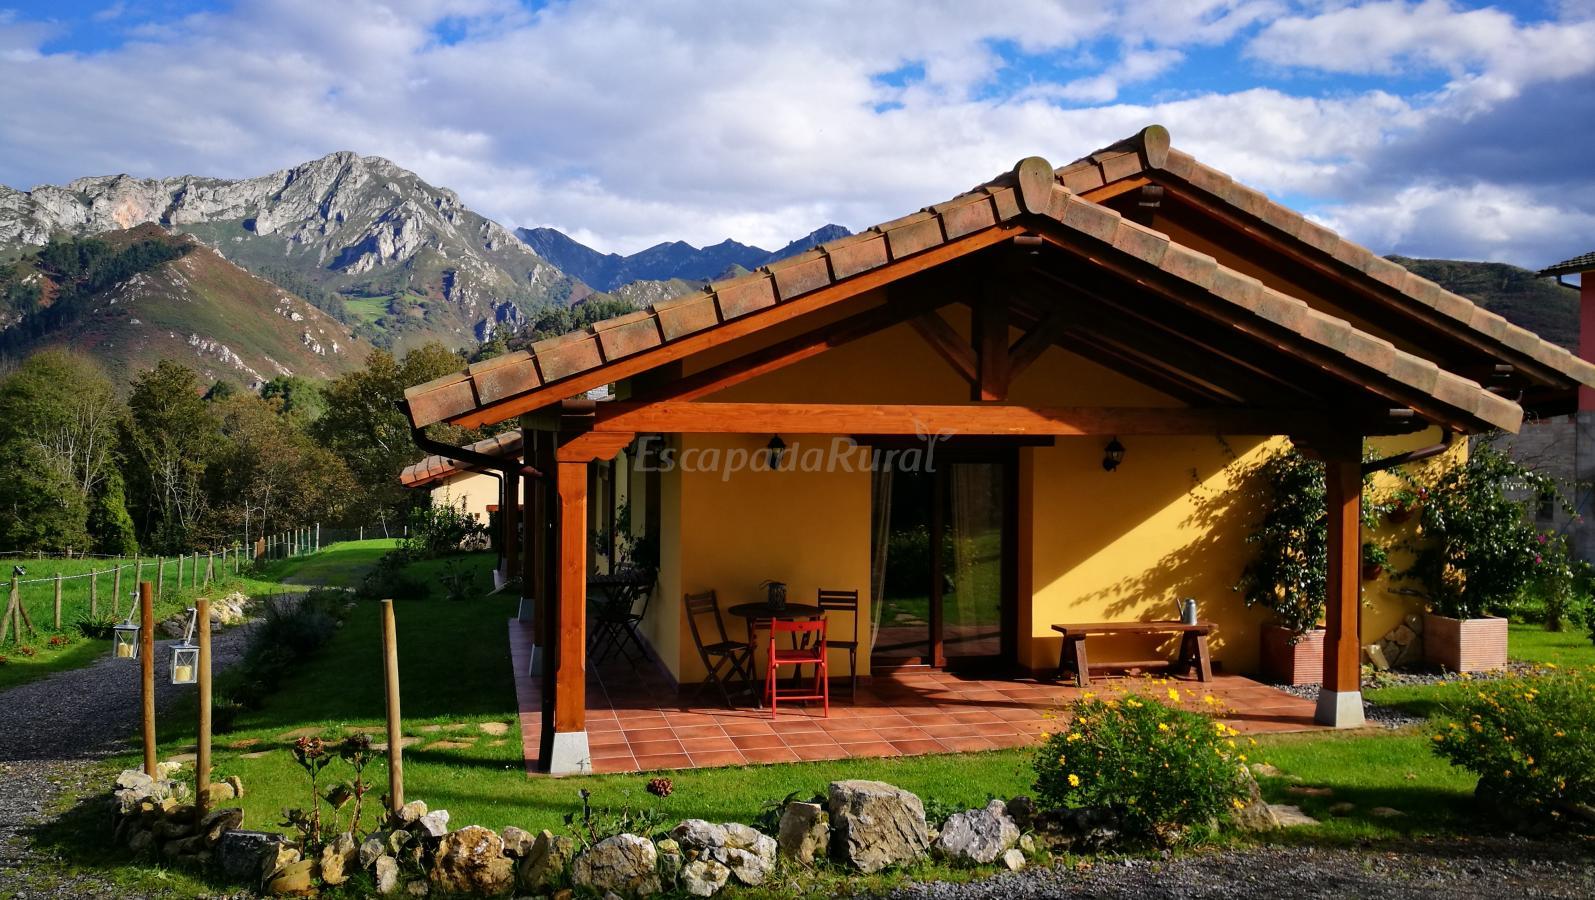 Fotos de entrecasta os casa rural en cangas de on s - Fotorural asturias ...